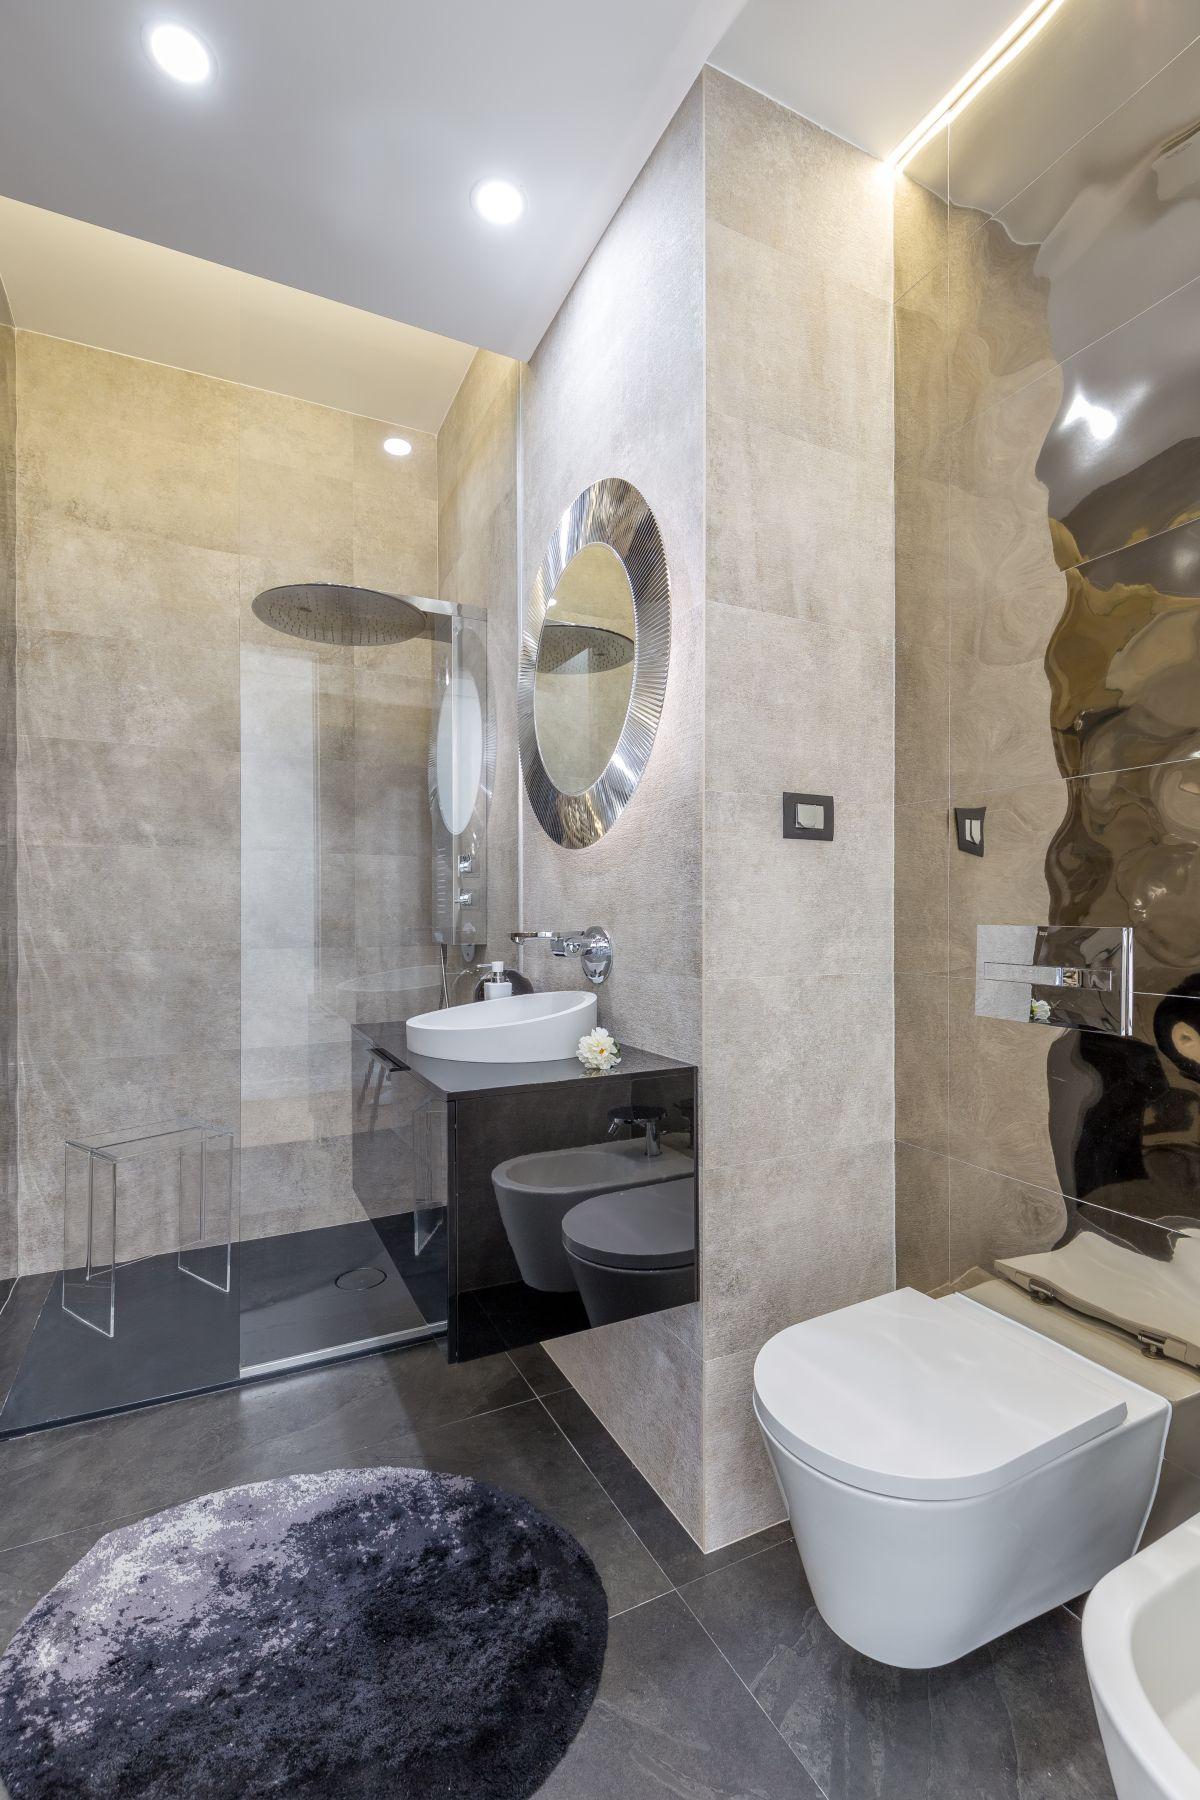 Modern bathrooms like this have plenty of shine.